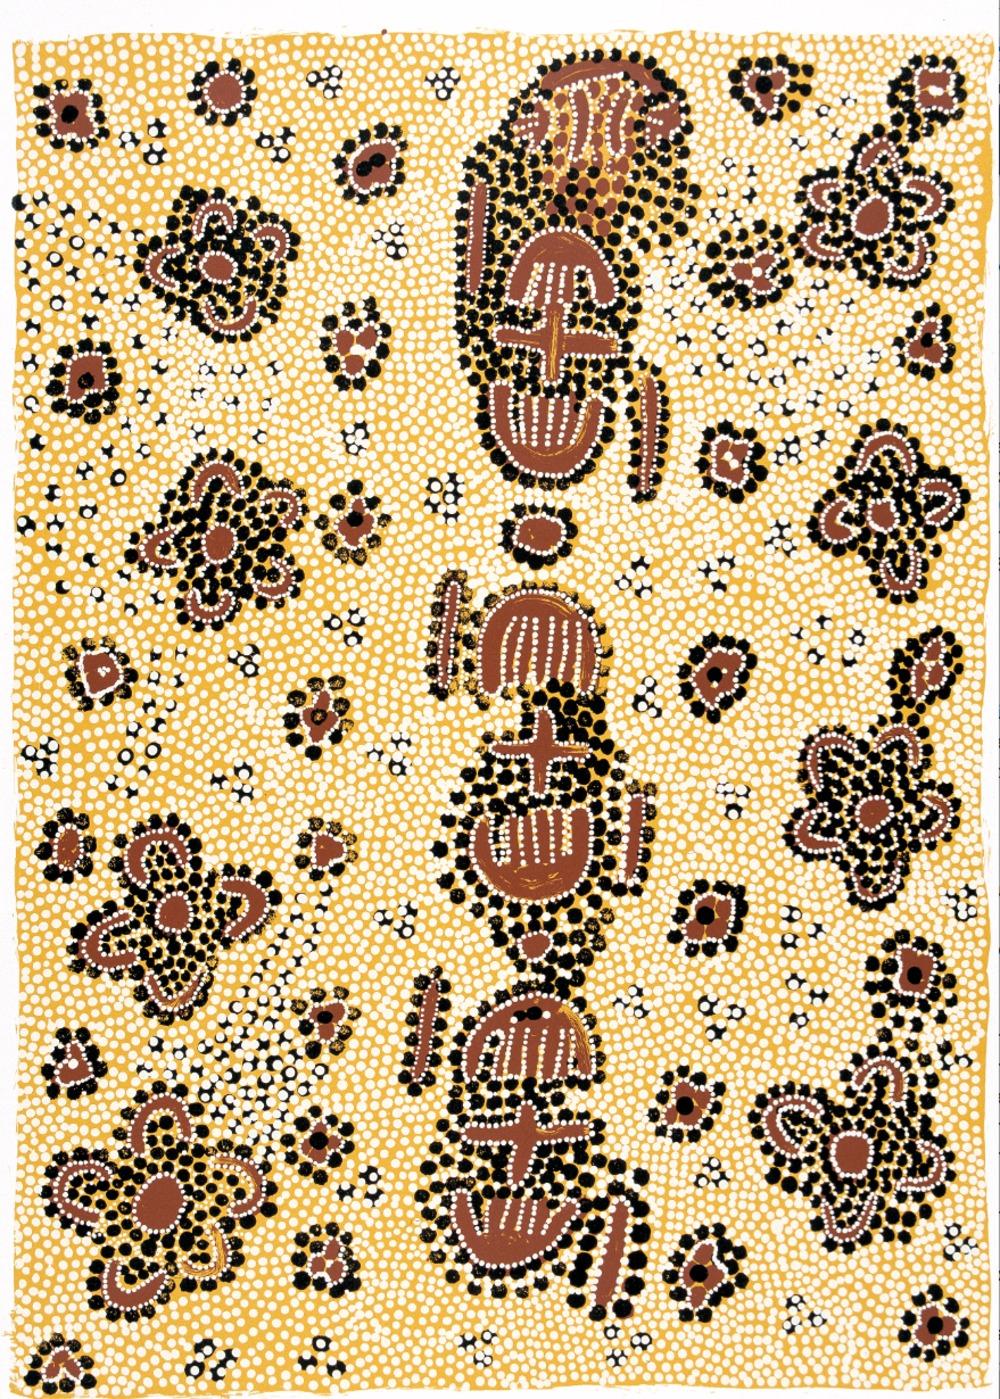 Molly Tasman Napurrurla, Warlpiri, 2003, Marrkirdi Jukurrpa, ('Wild Bush Plum Dreaming'), on Magnani Pescia paper, image size 490x320 mm.